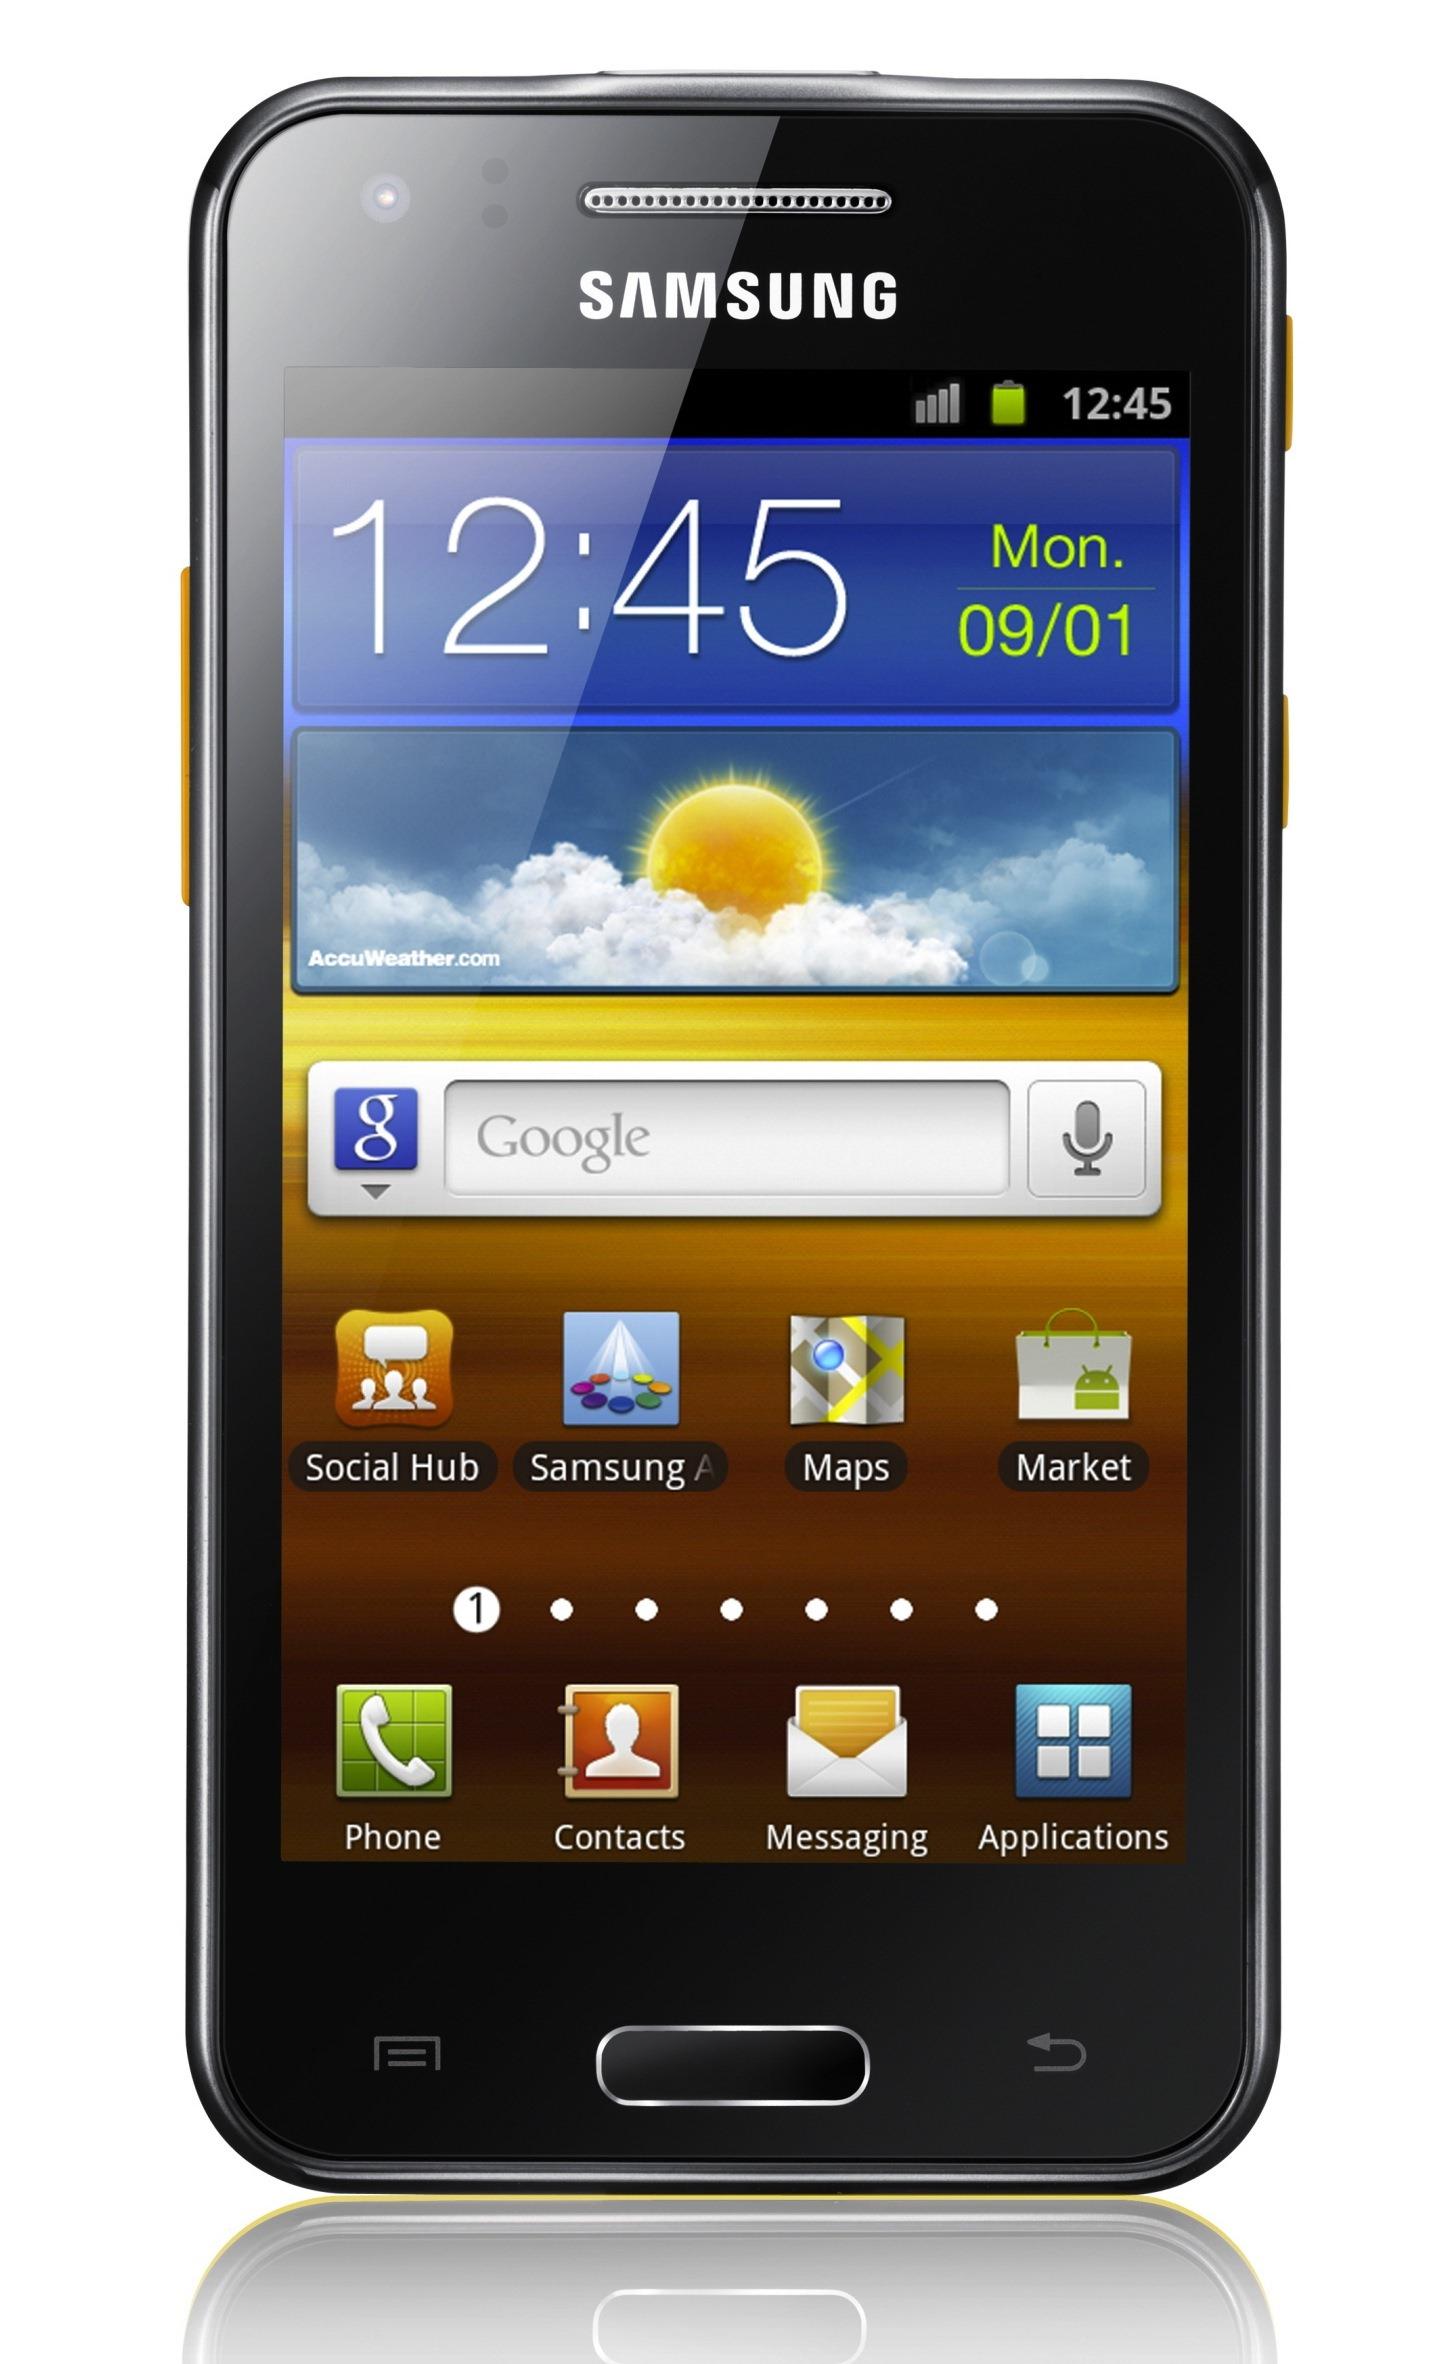 [MWC 2012] Samsung Galaxy Beam Hands-On